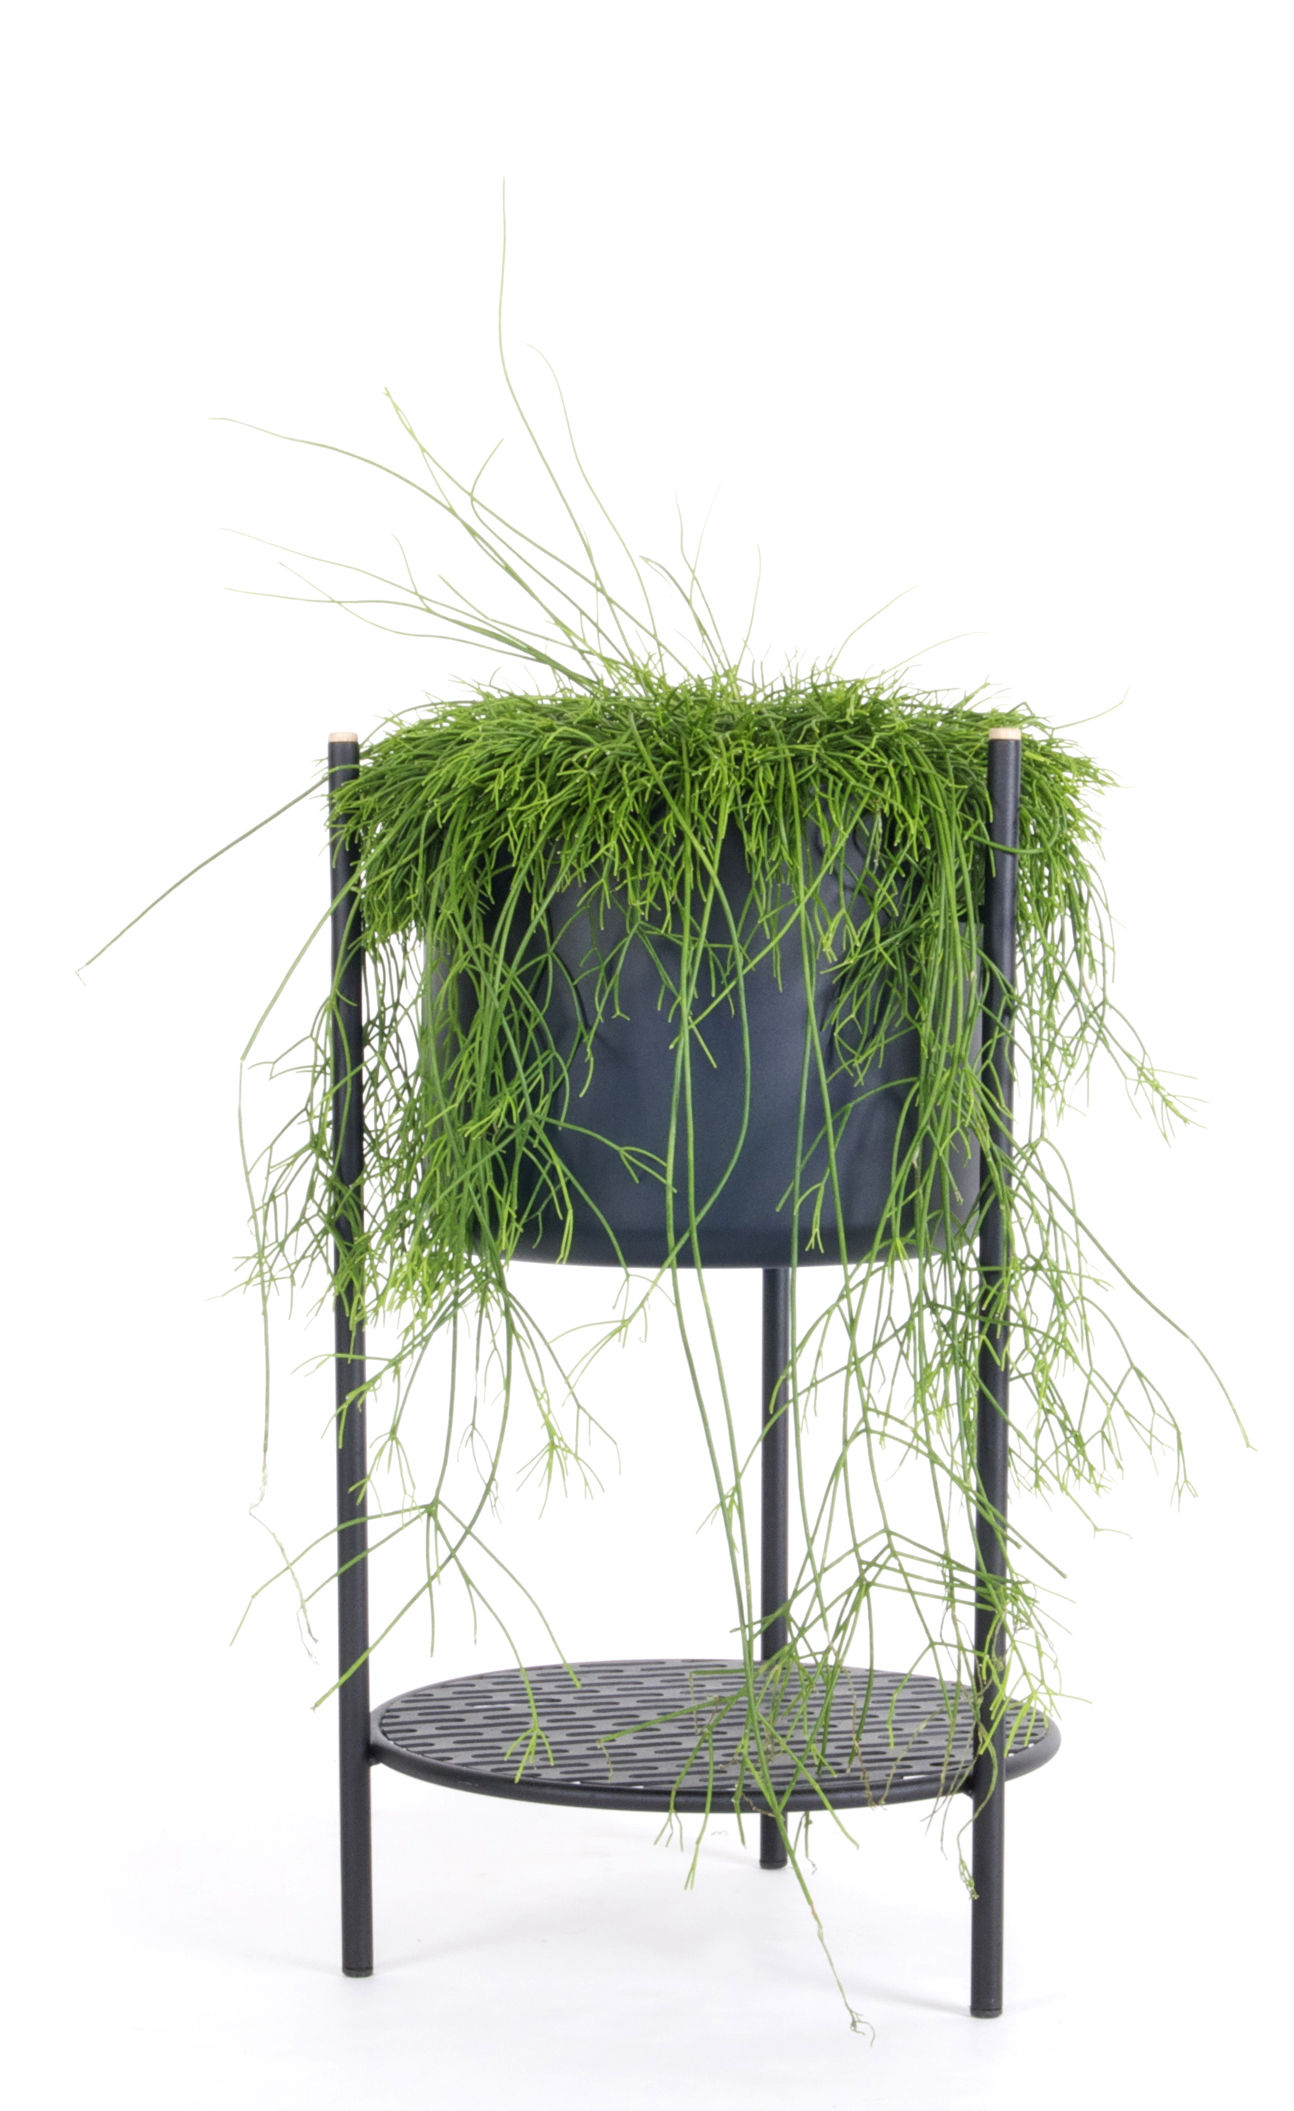 Outdoor - Pots et plantes - Pot de fleurs Ent Small / H 56 cm - Métal - XL Boom - Noir - Acier laqué époxy